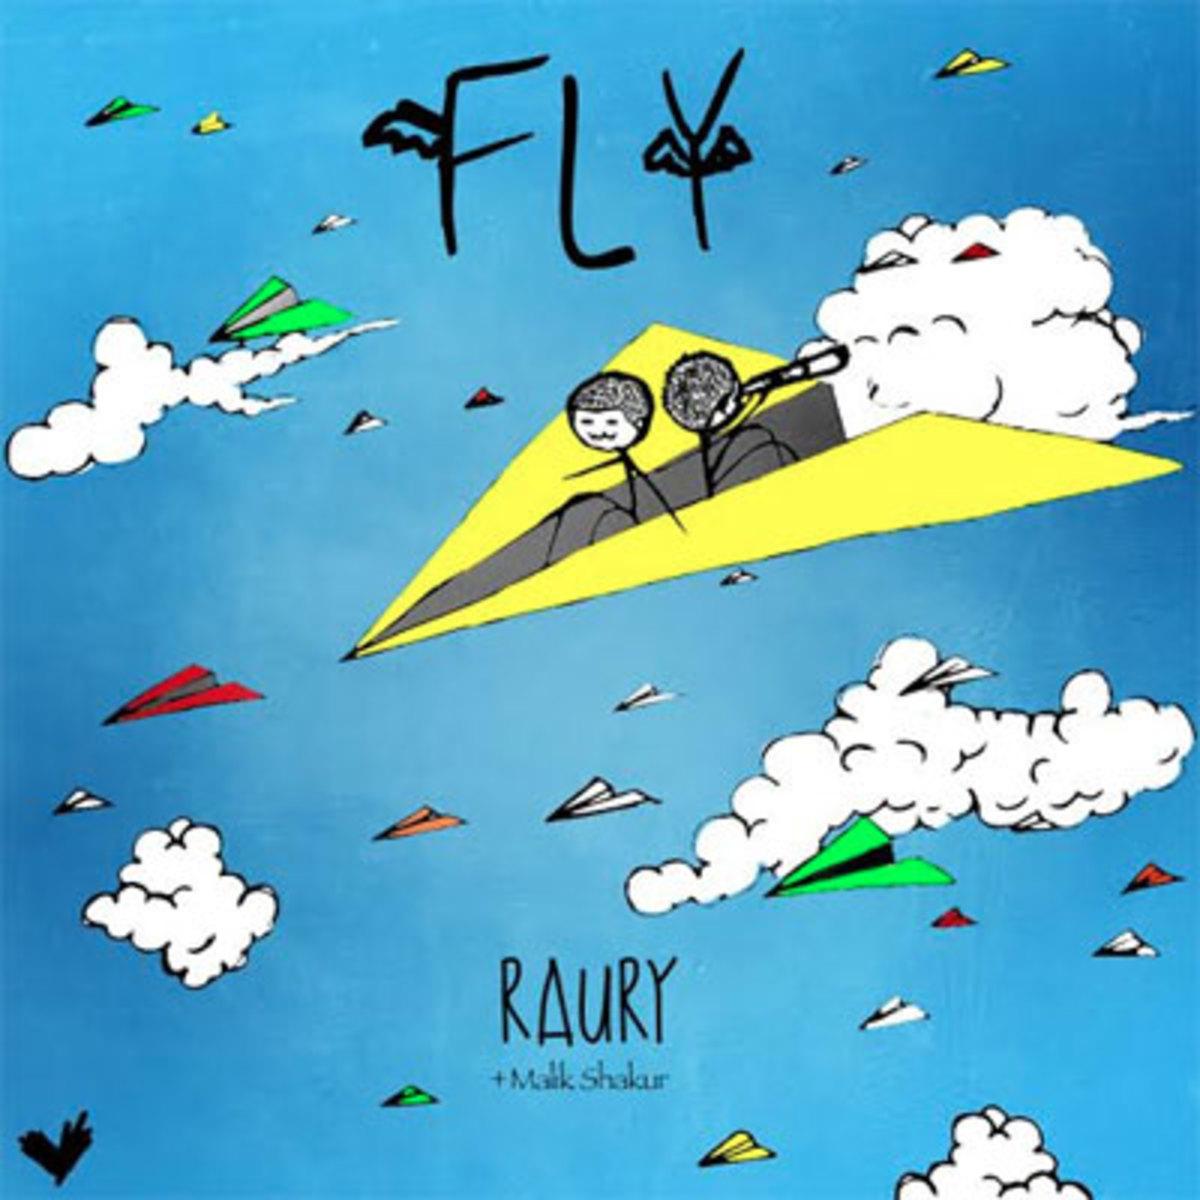 raury-fly.jpg